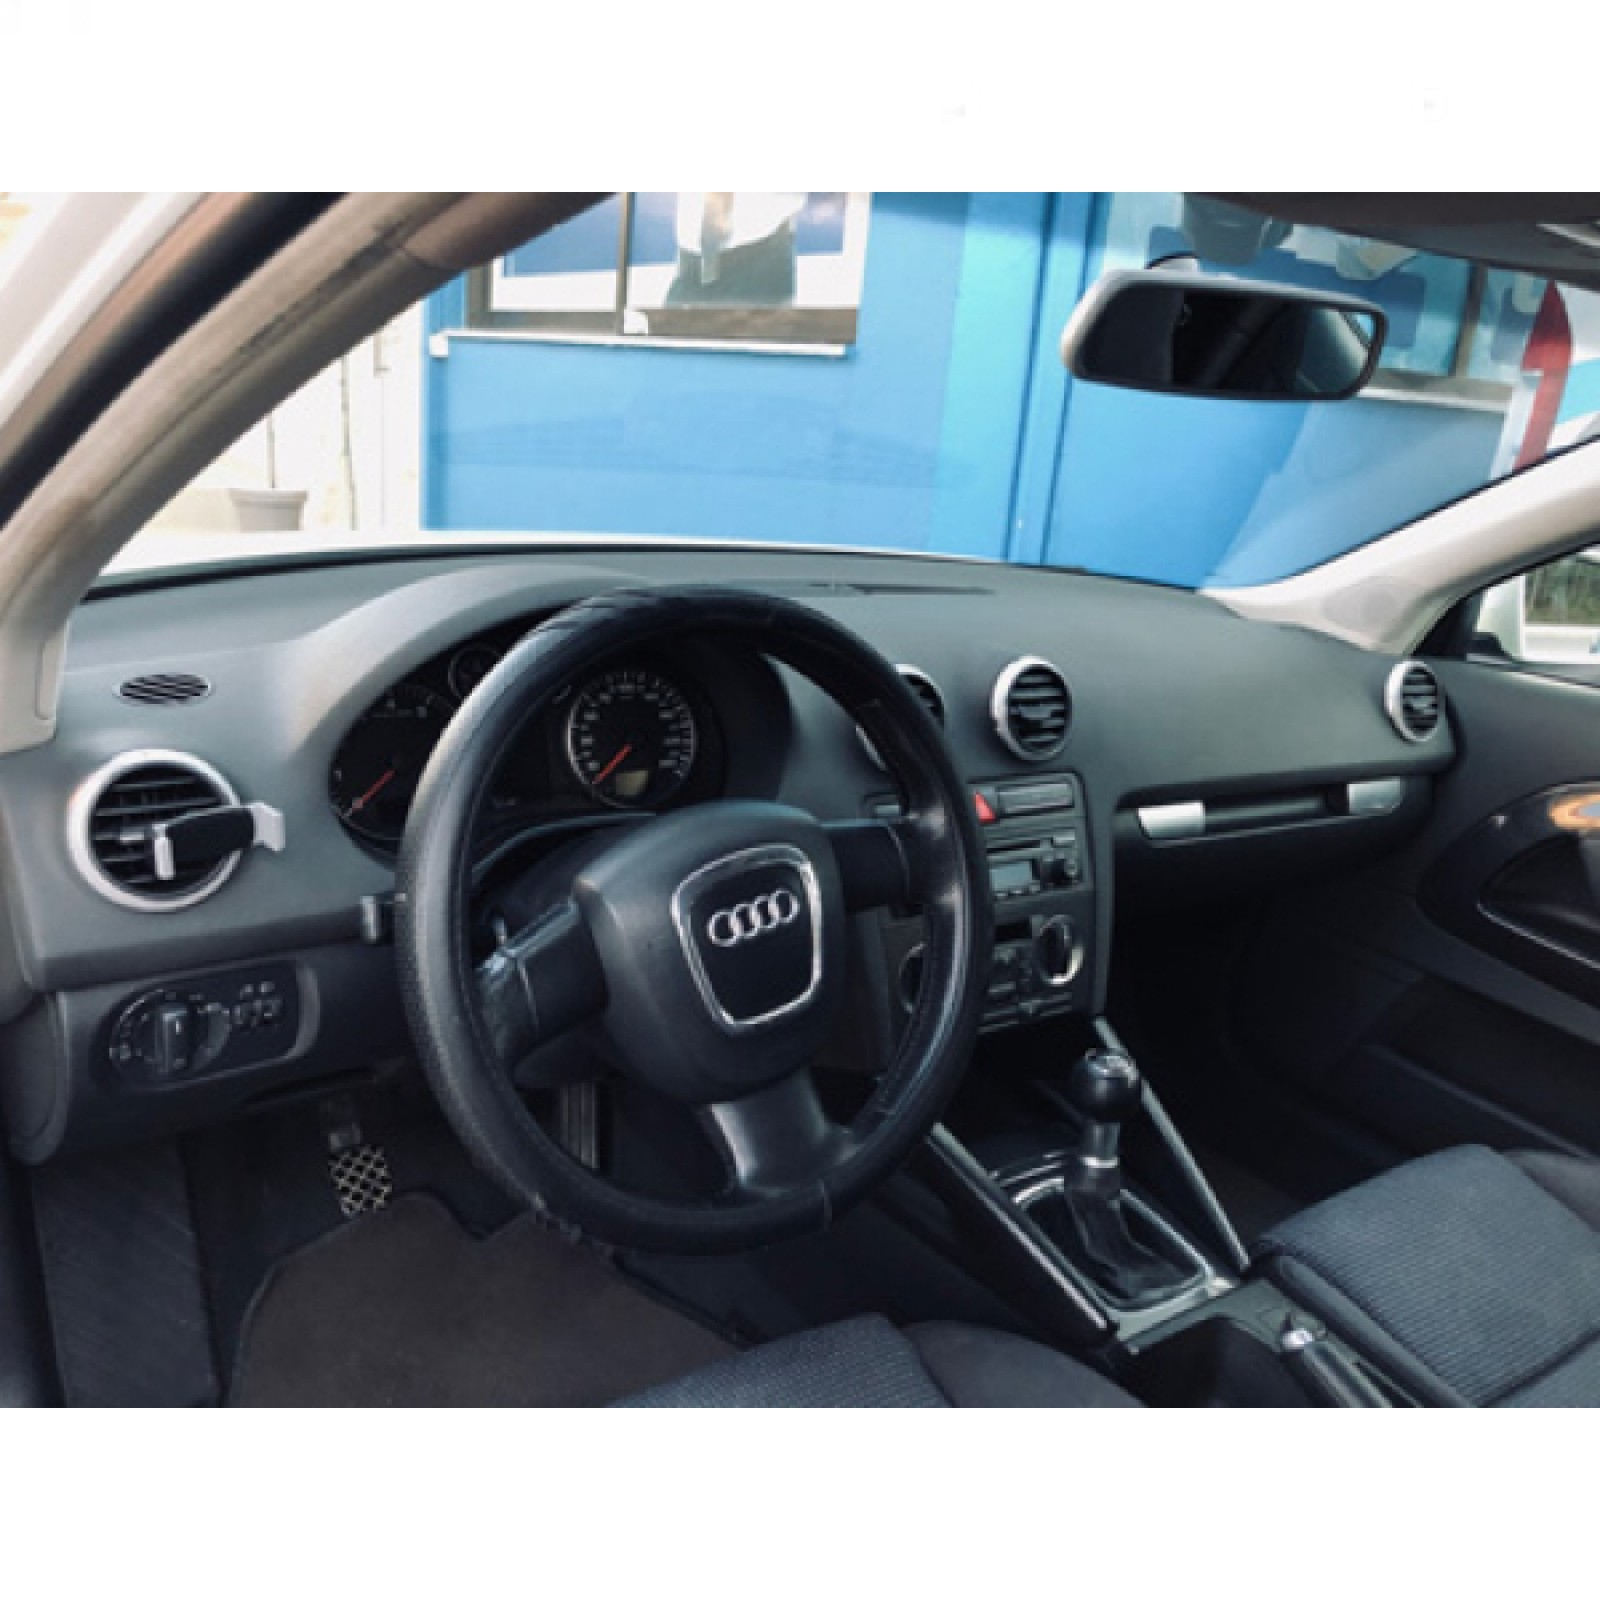 Audi A3 06'